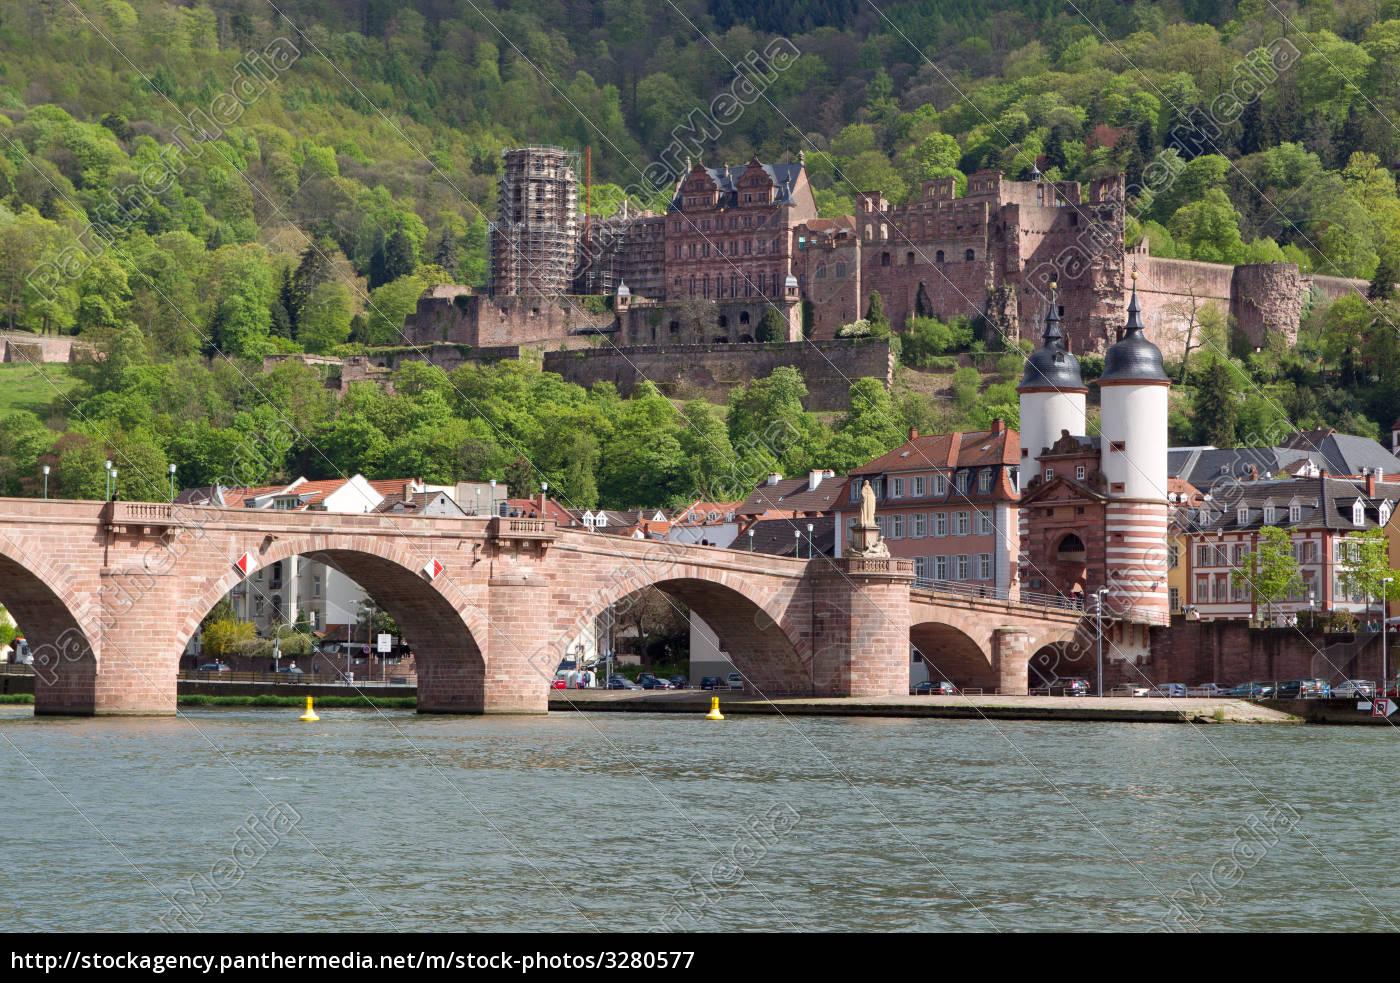 heidelberger, castle - 3280577